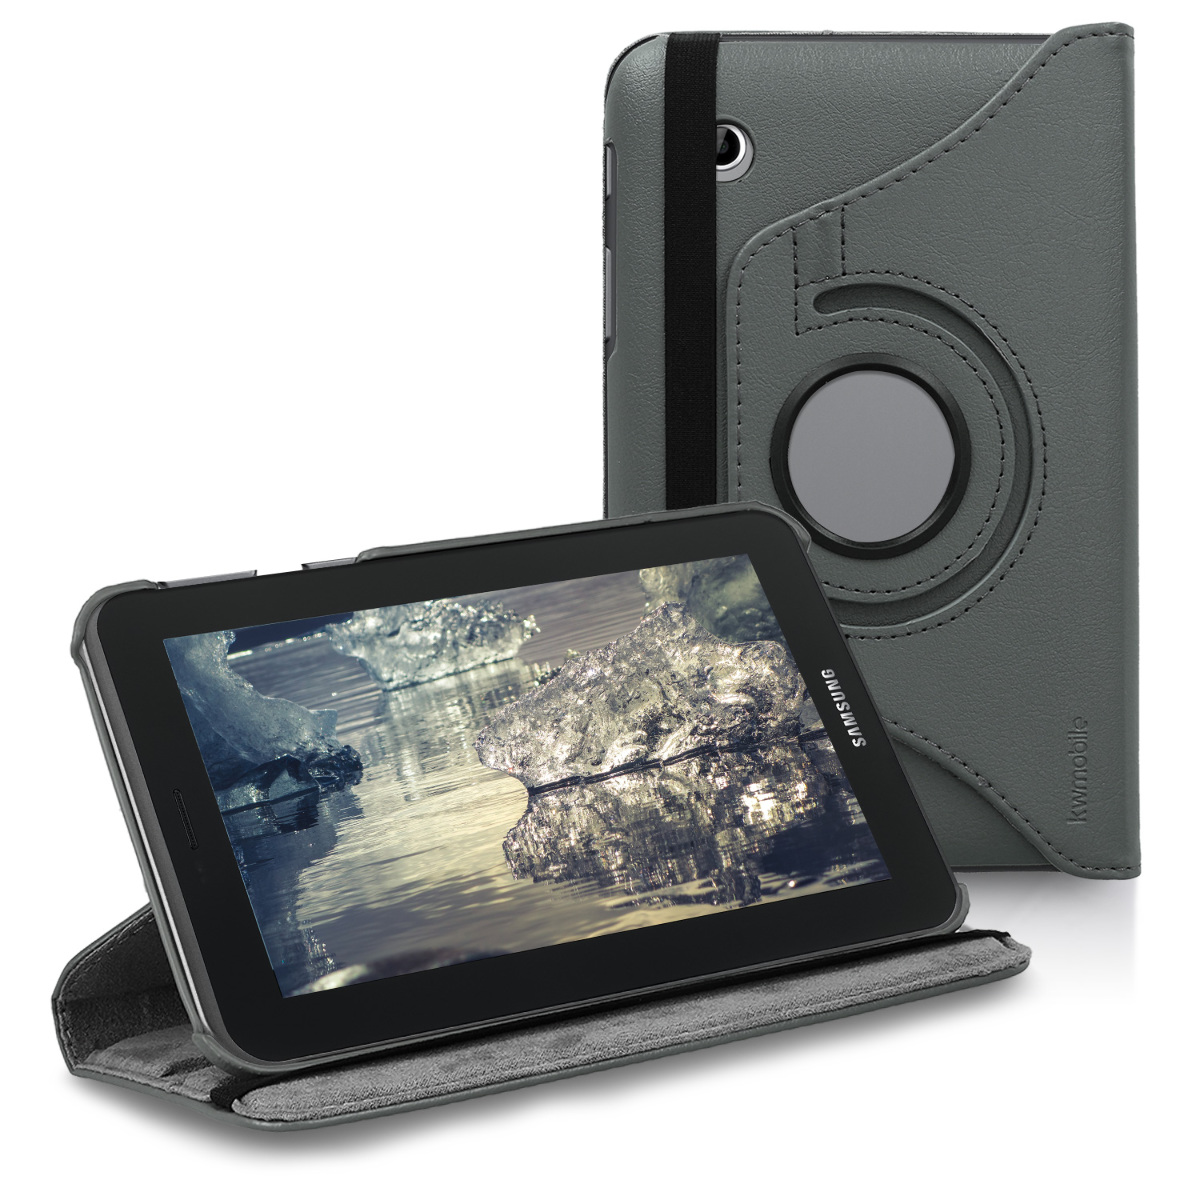 KW Θήκη 360° Samsung Galaxy Tab 2 7.0 P3110 / P3100 - Συνθετικό Δέρμα - Anthracite (11210.73)